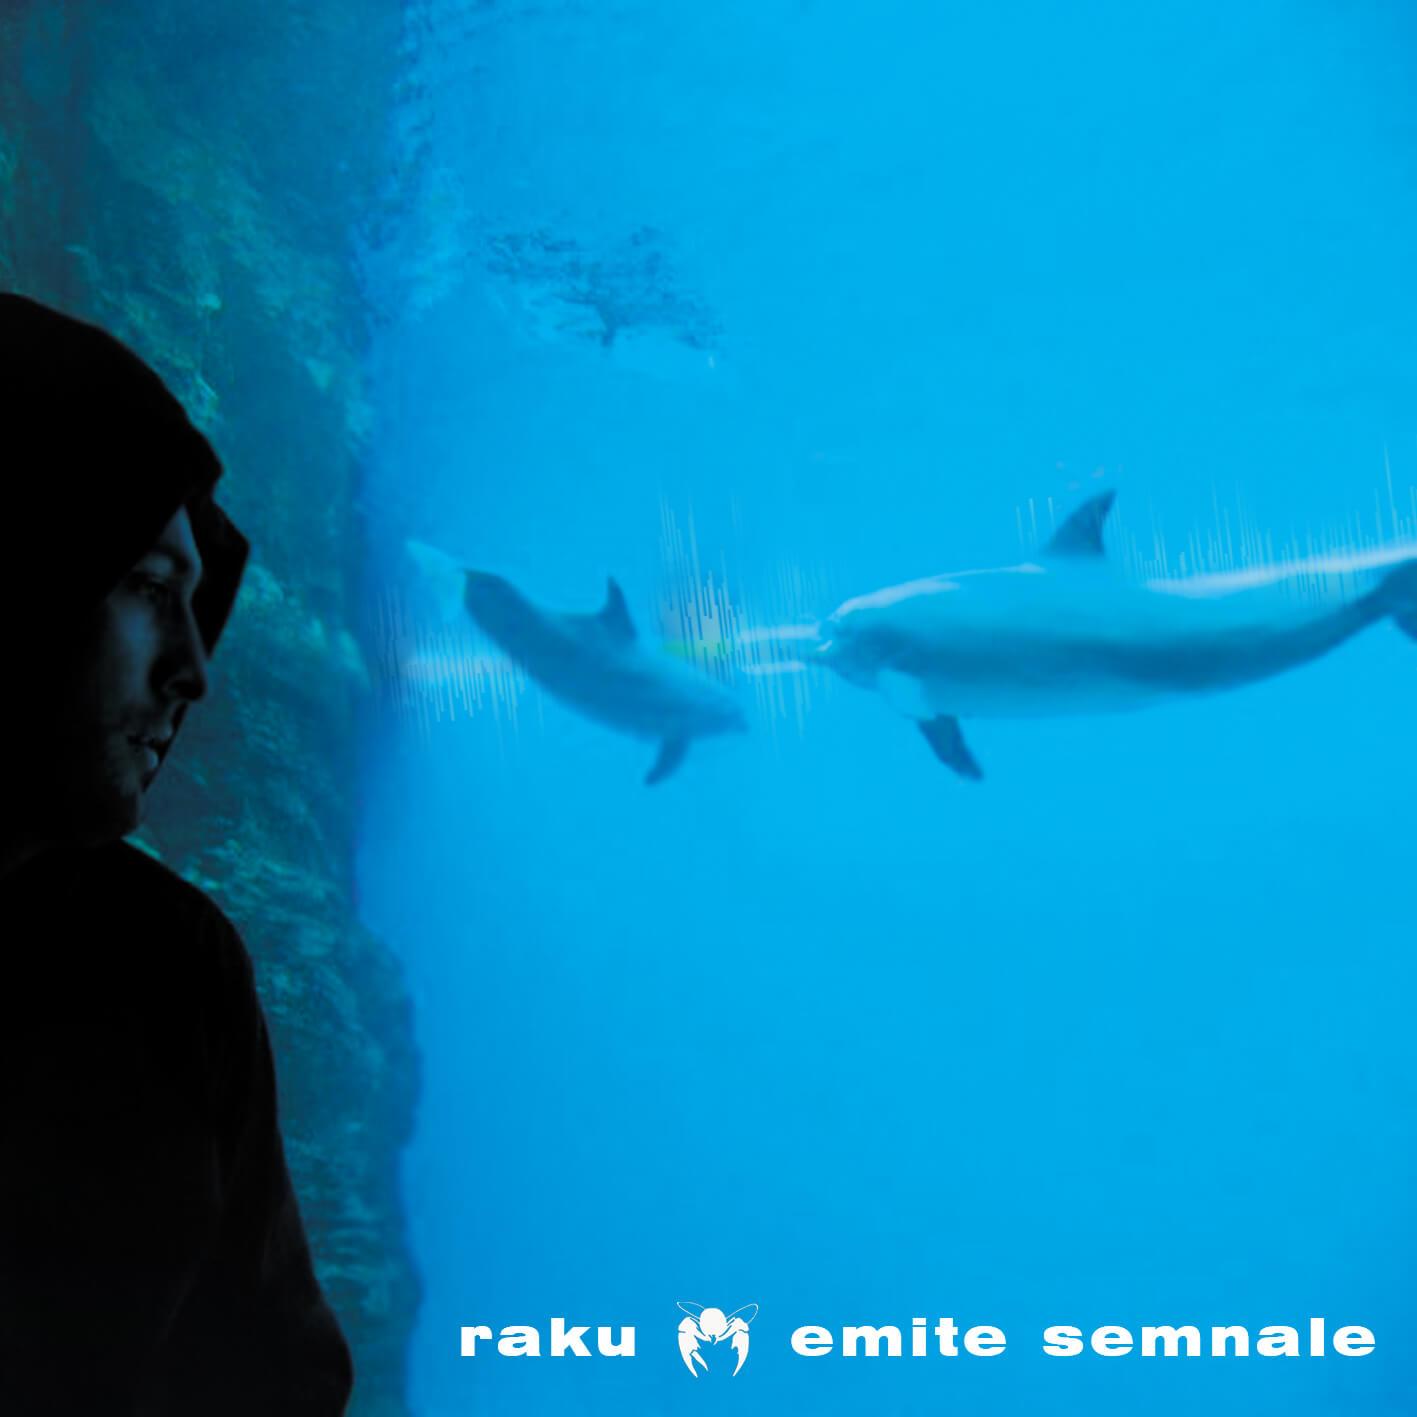 raku-emite-semnale-A